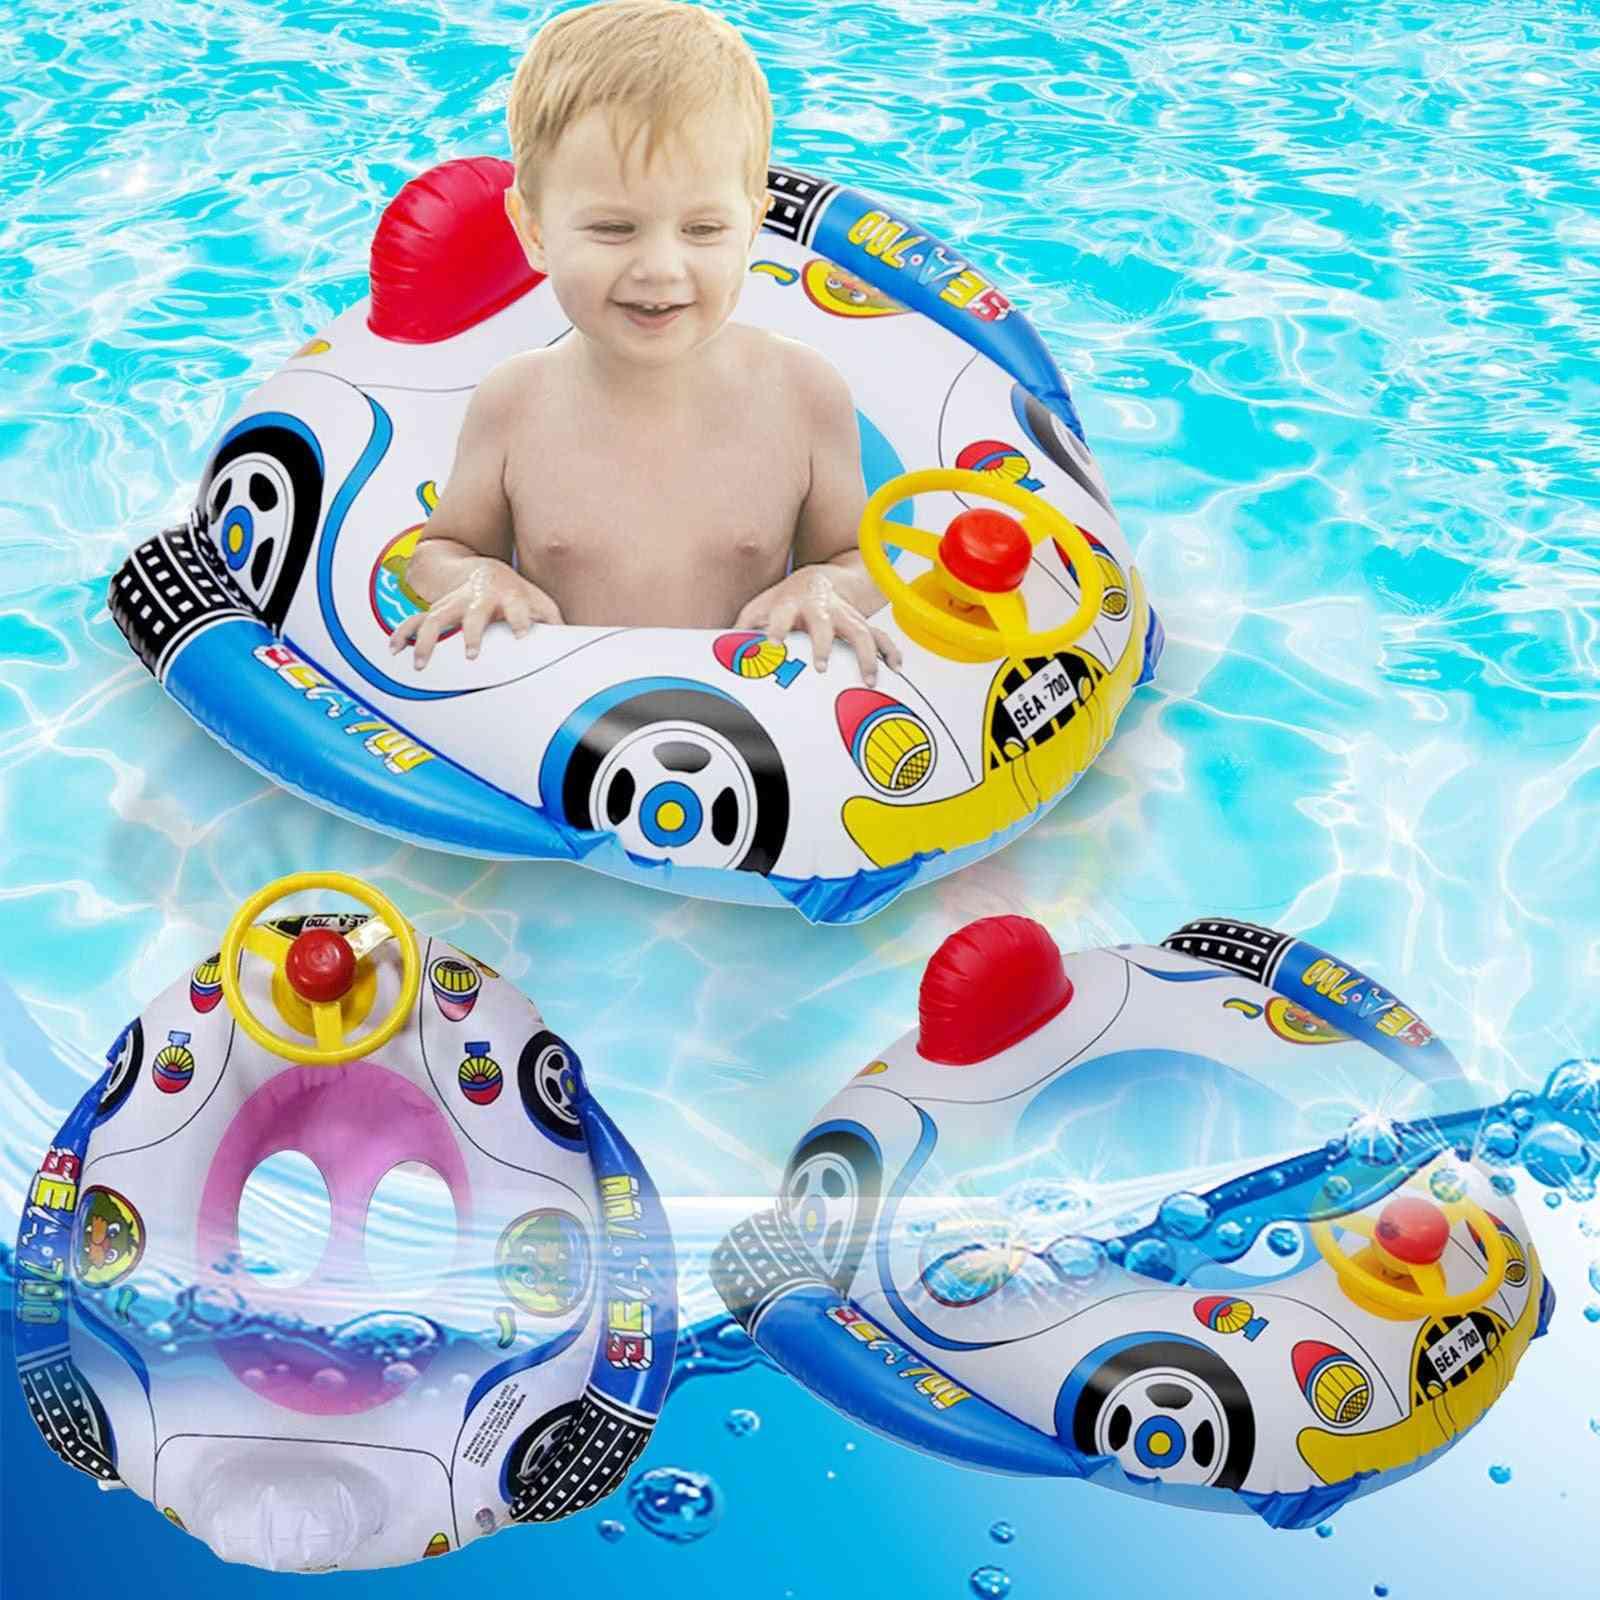 Baby Inflatable Pool Ring Lap Swim Seat